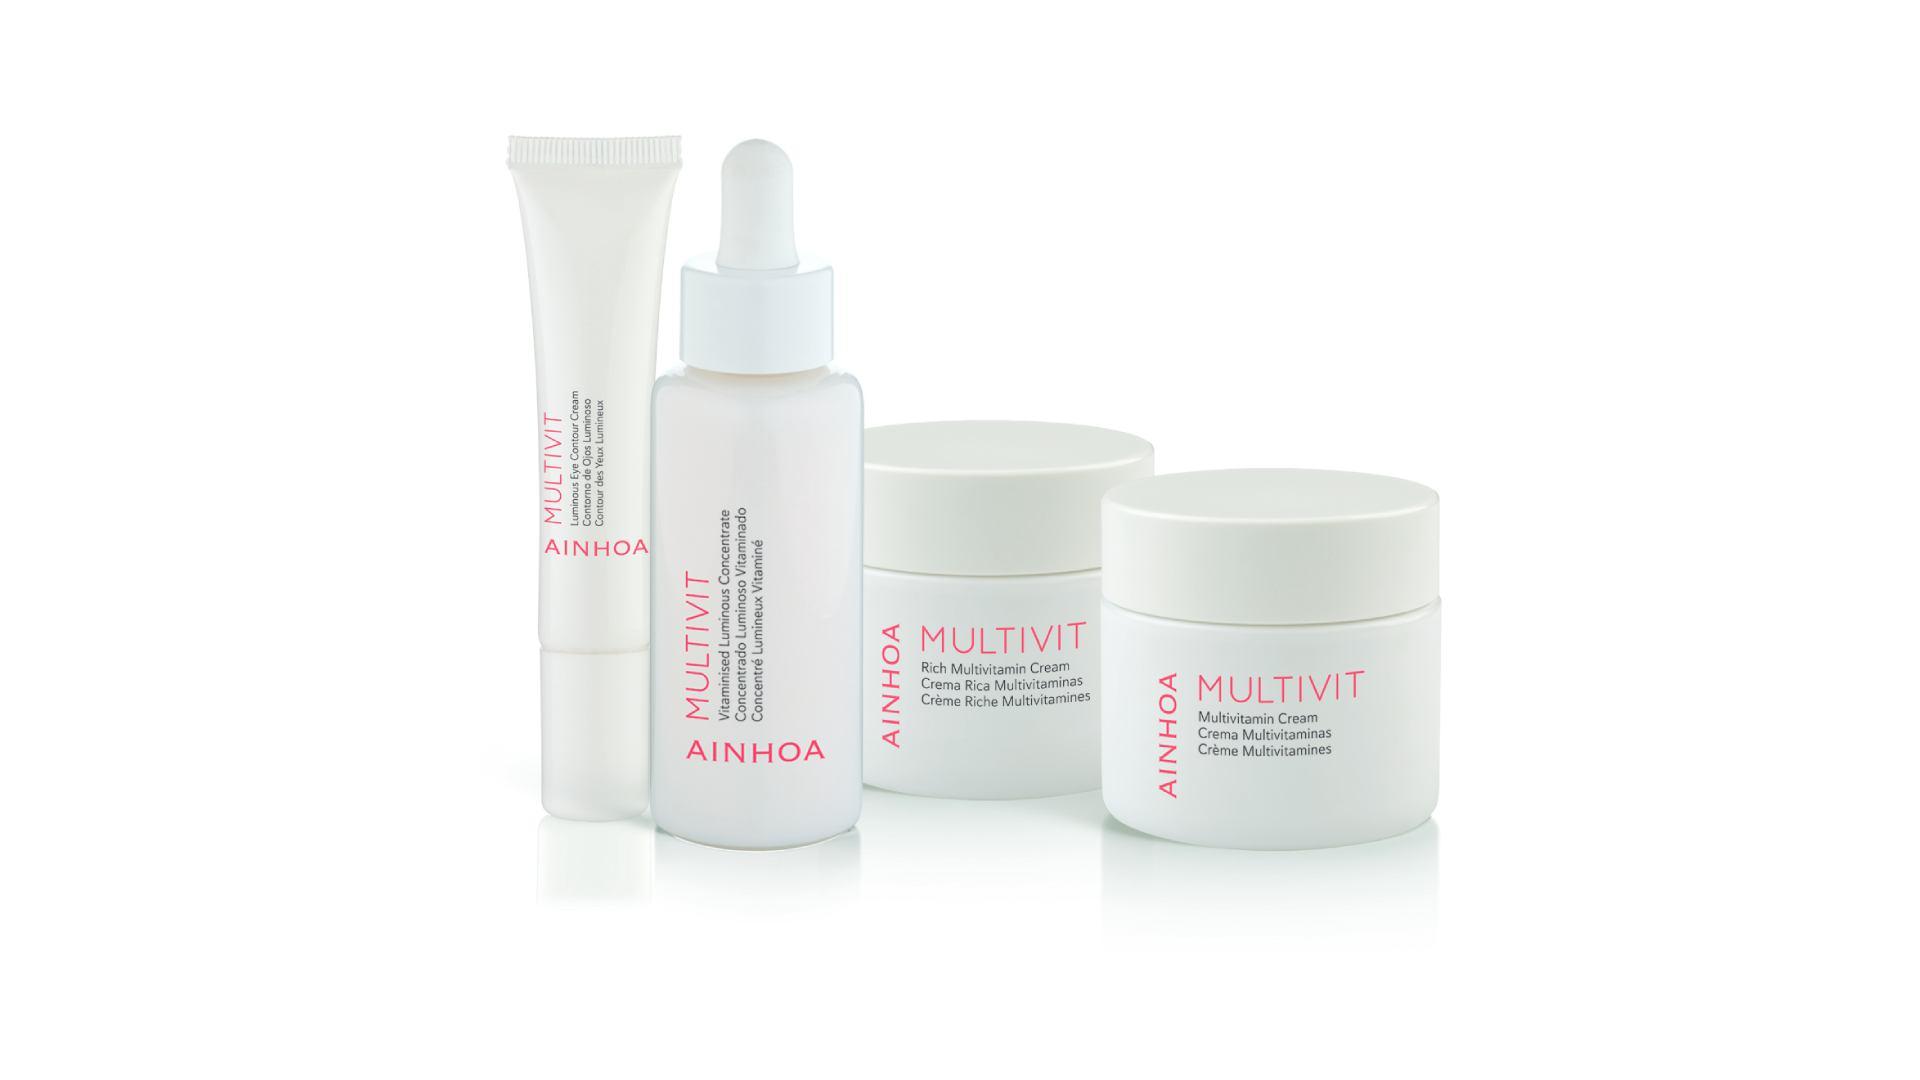 Ainhoa MULTIVIT Retail Products